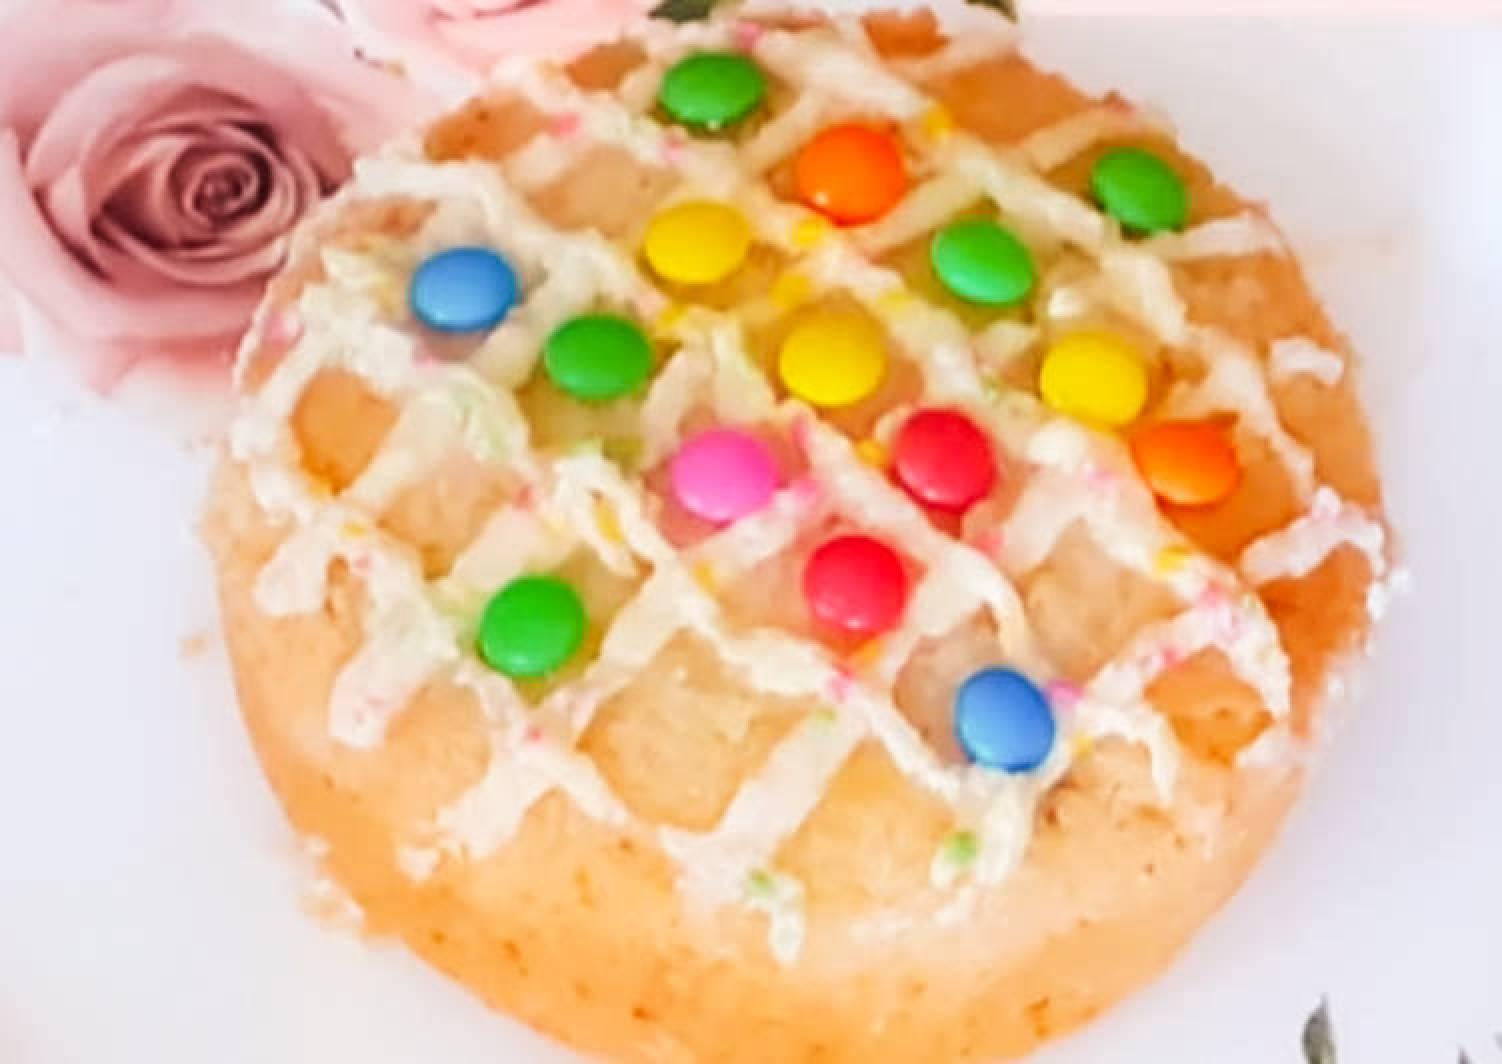 Vanilla sponge cake in a pressure cooker with